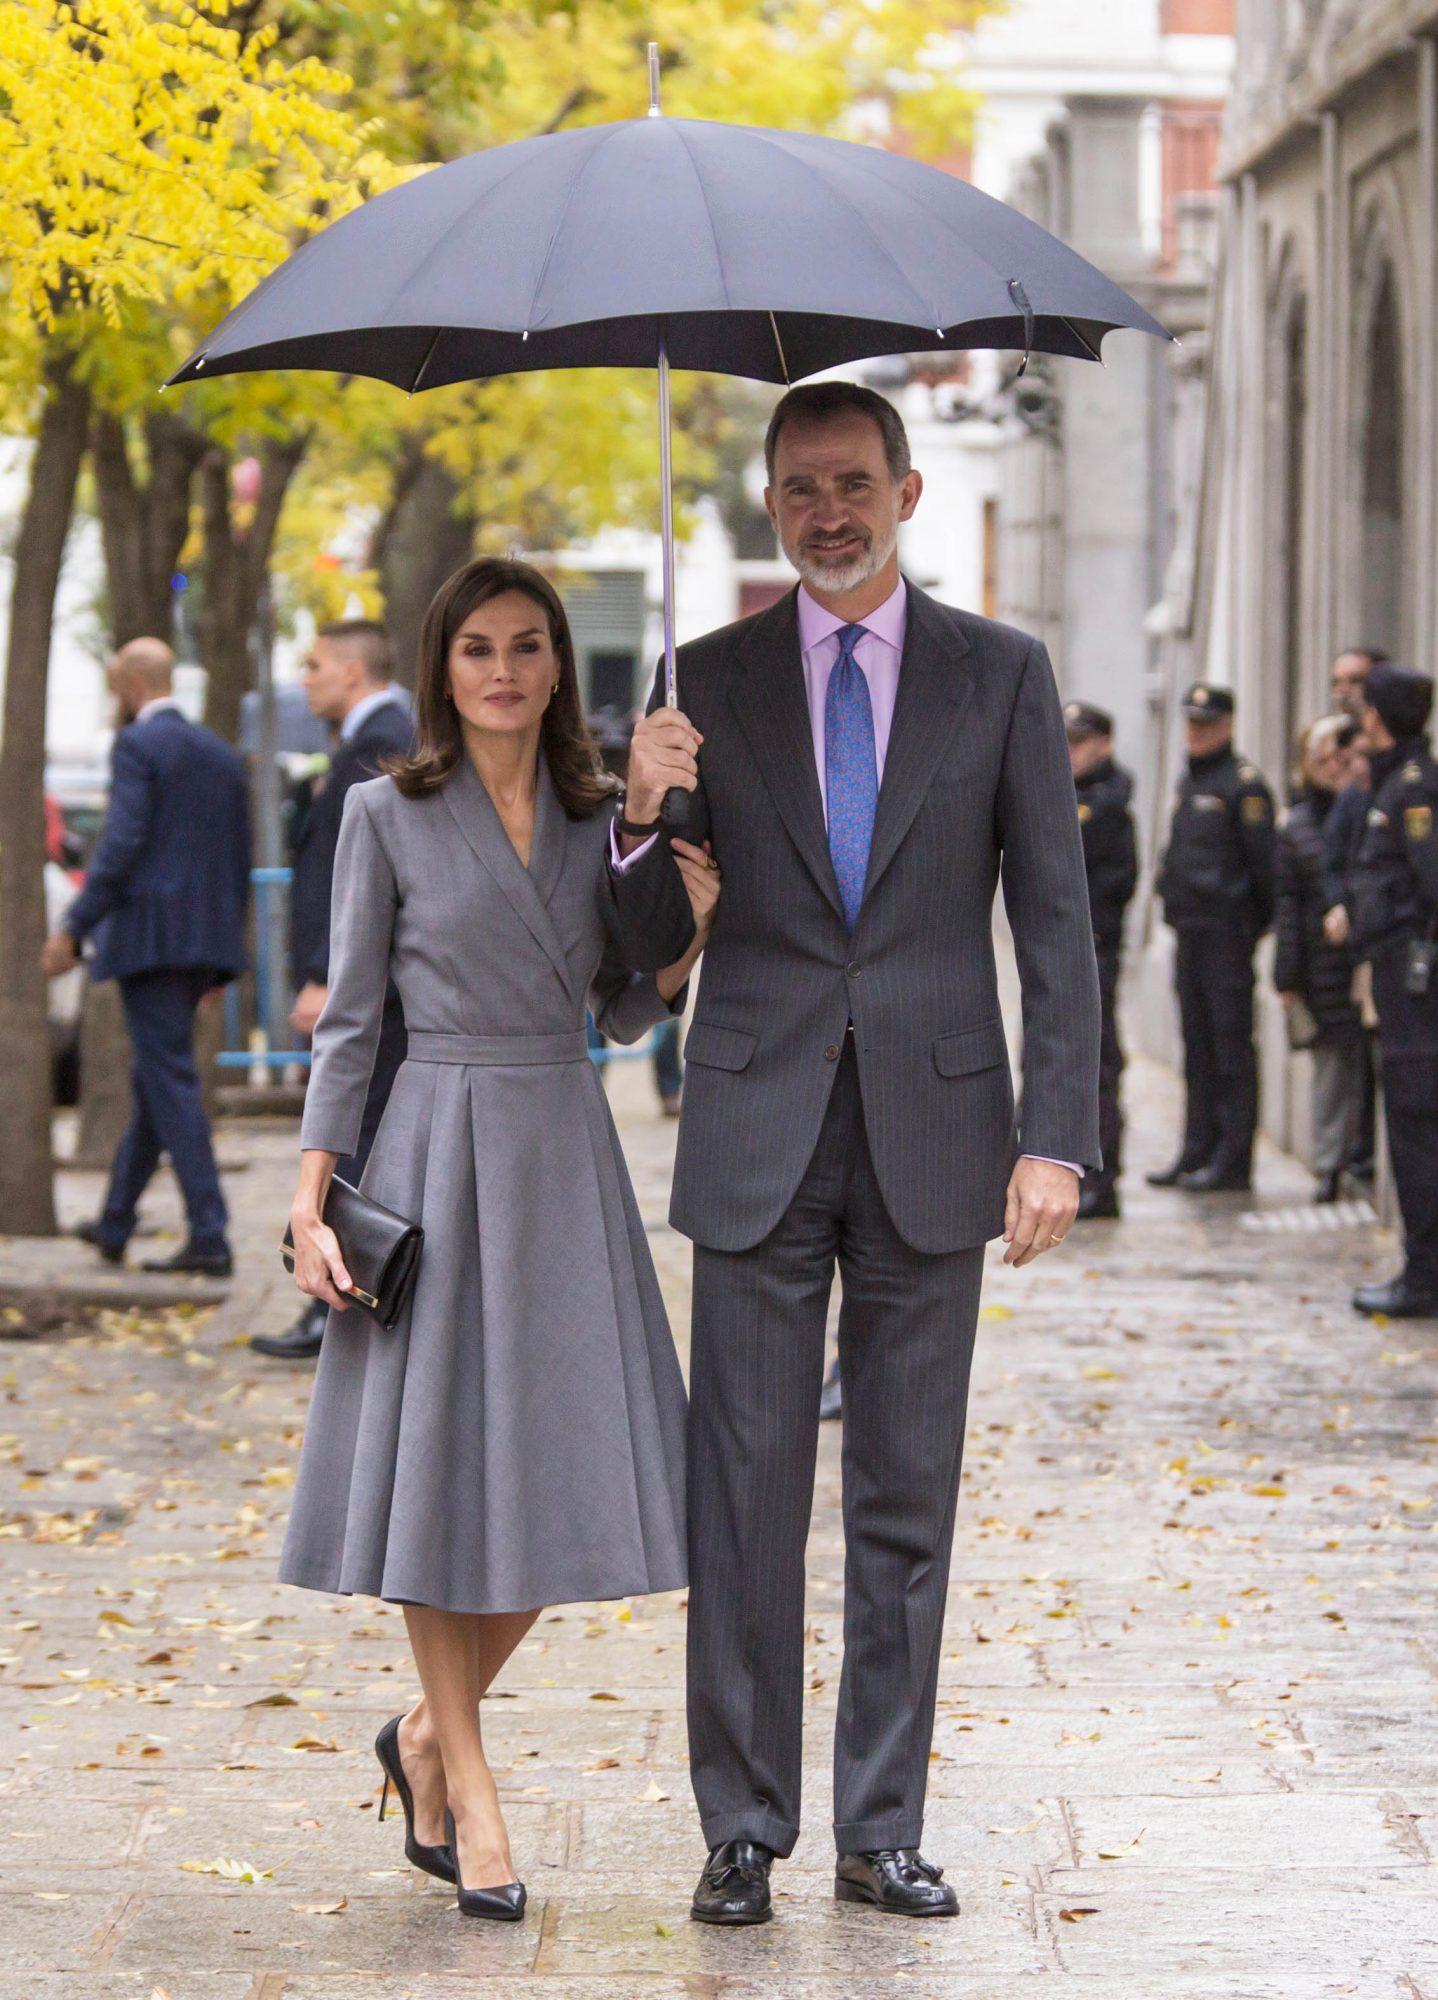 Spanish Royals Leave Observatory Award Against Domestic and Gender Violence 2019